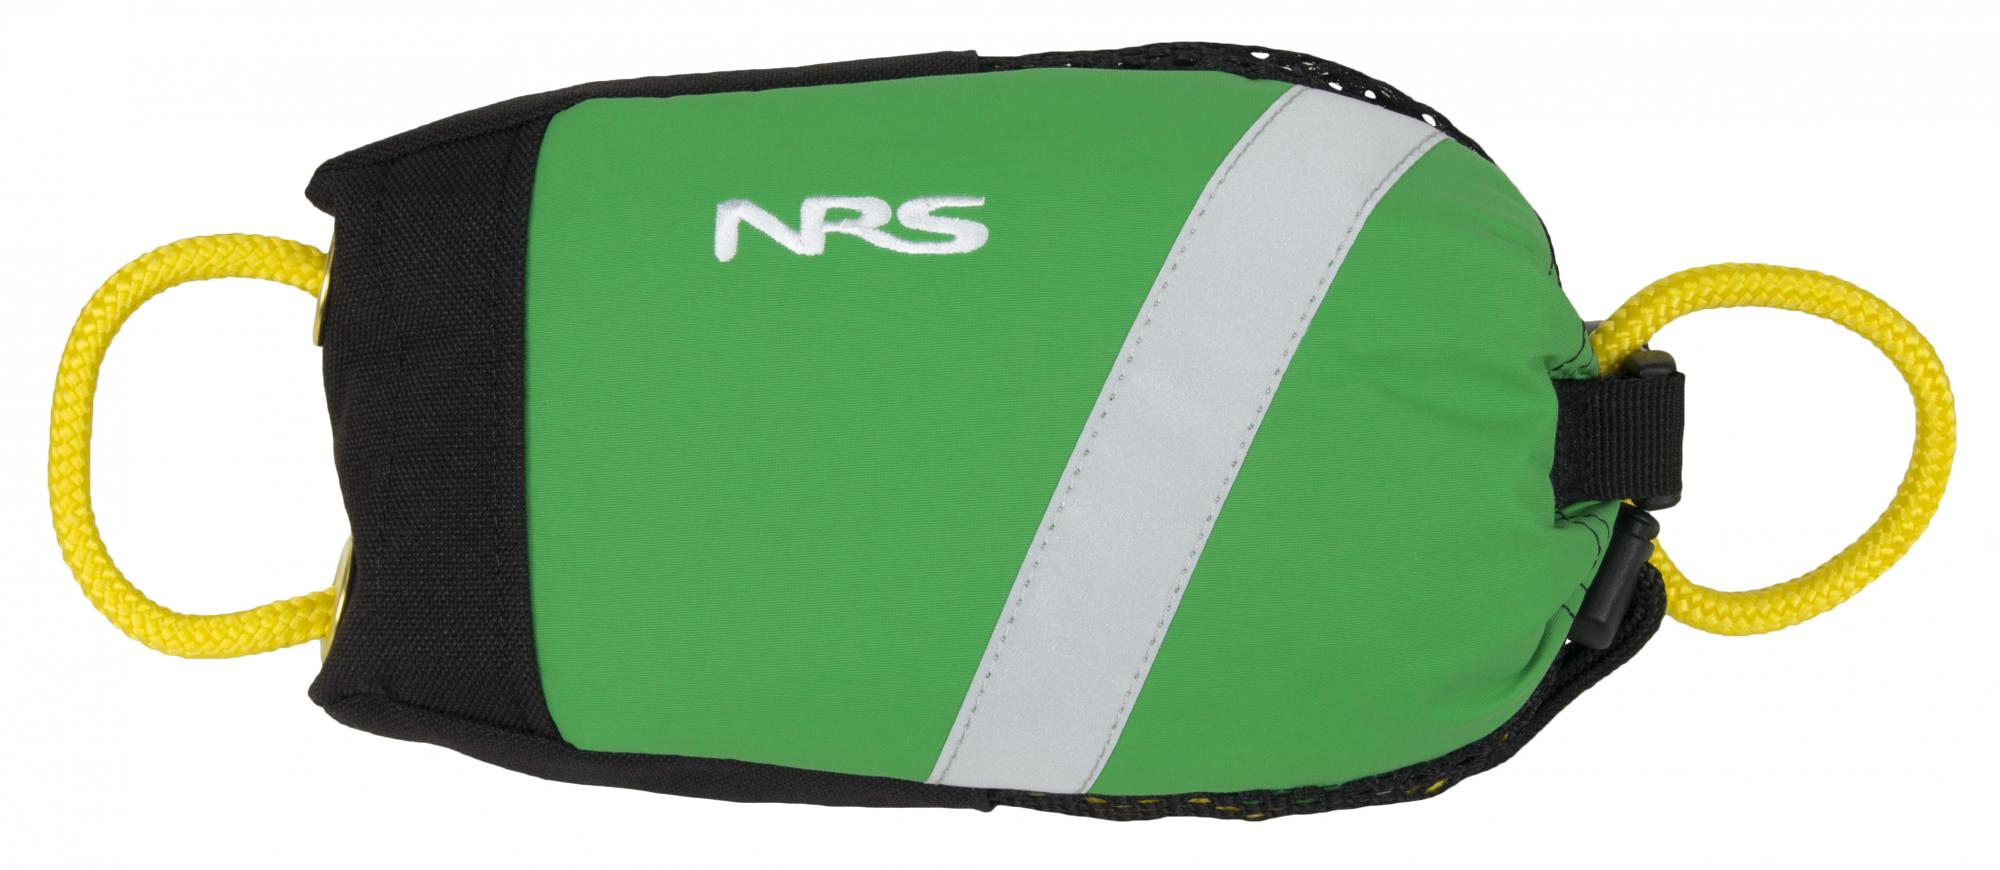 NRS Wedge Throw Bag